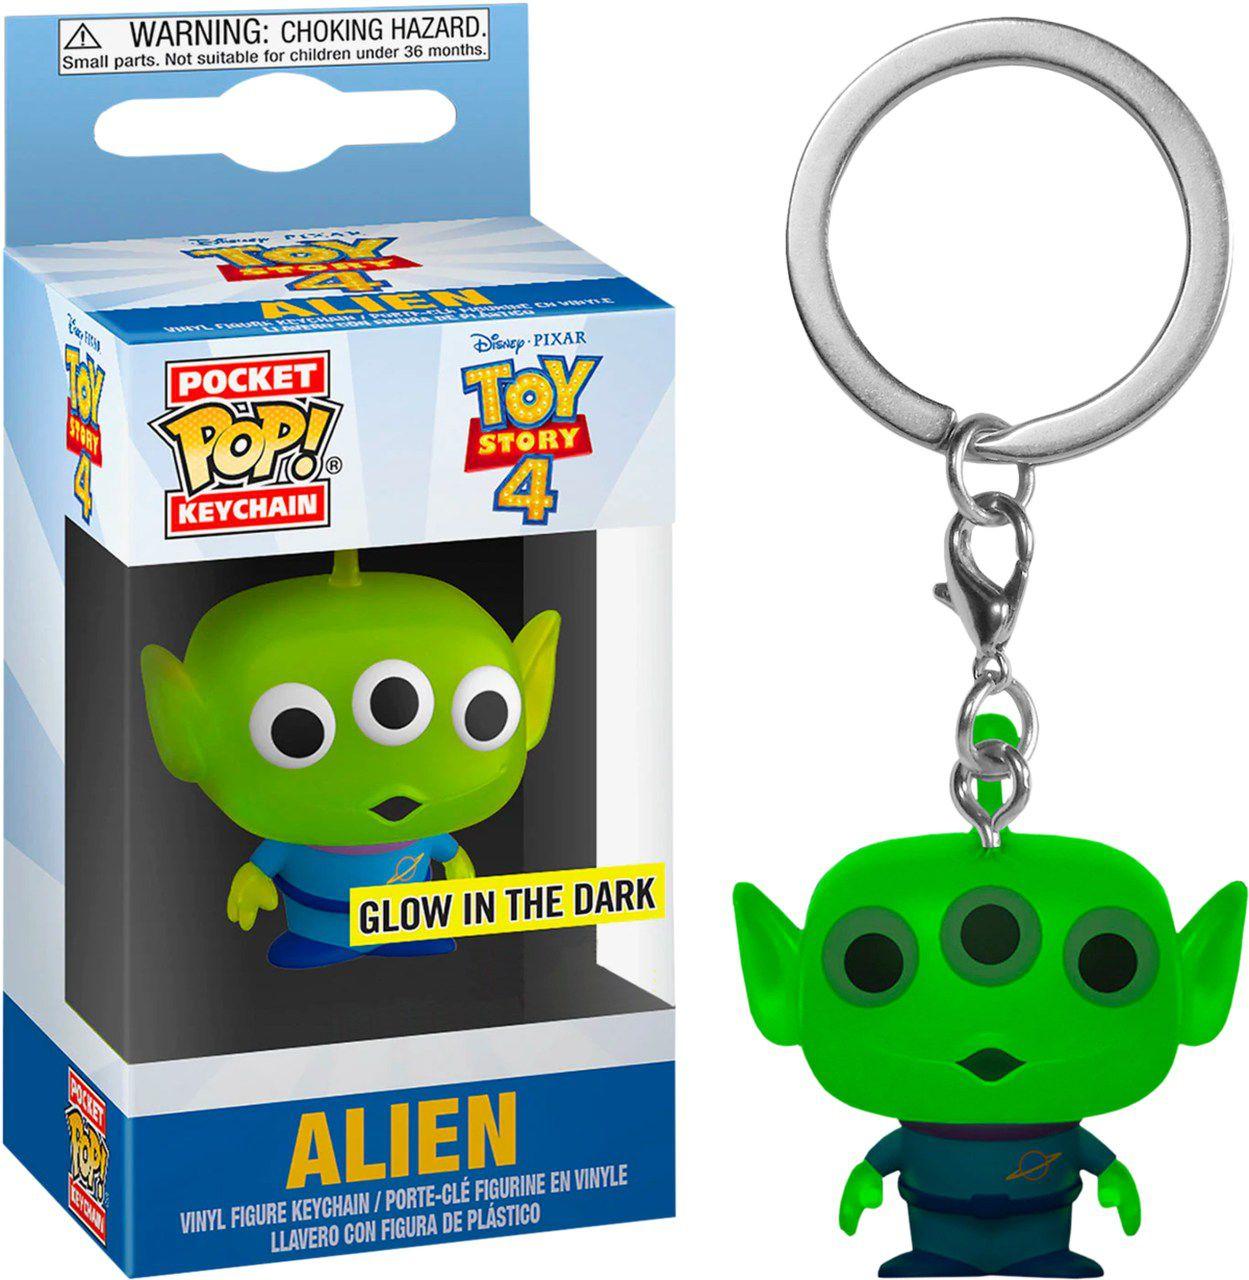 Funko Pocket Pop Keychains (Chaveiro) Alien brilha no escuro (Alien Glow in the dark): Toy Story 4 - Funko